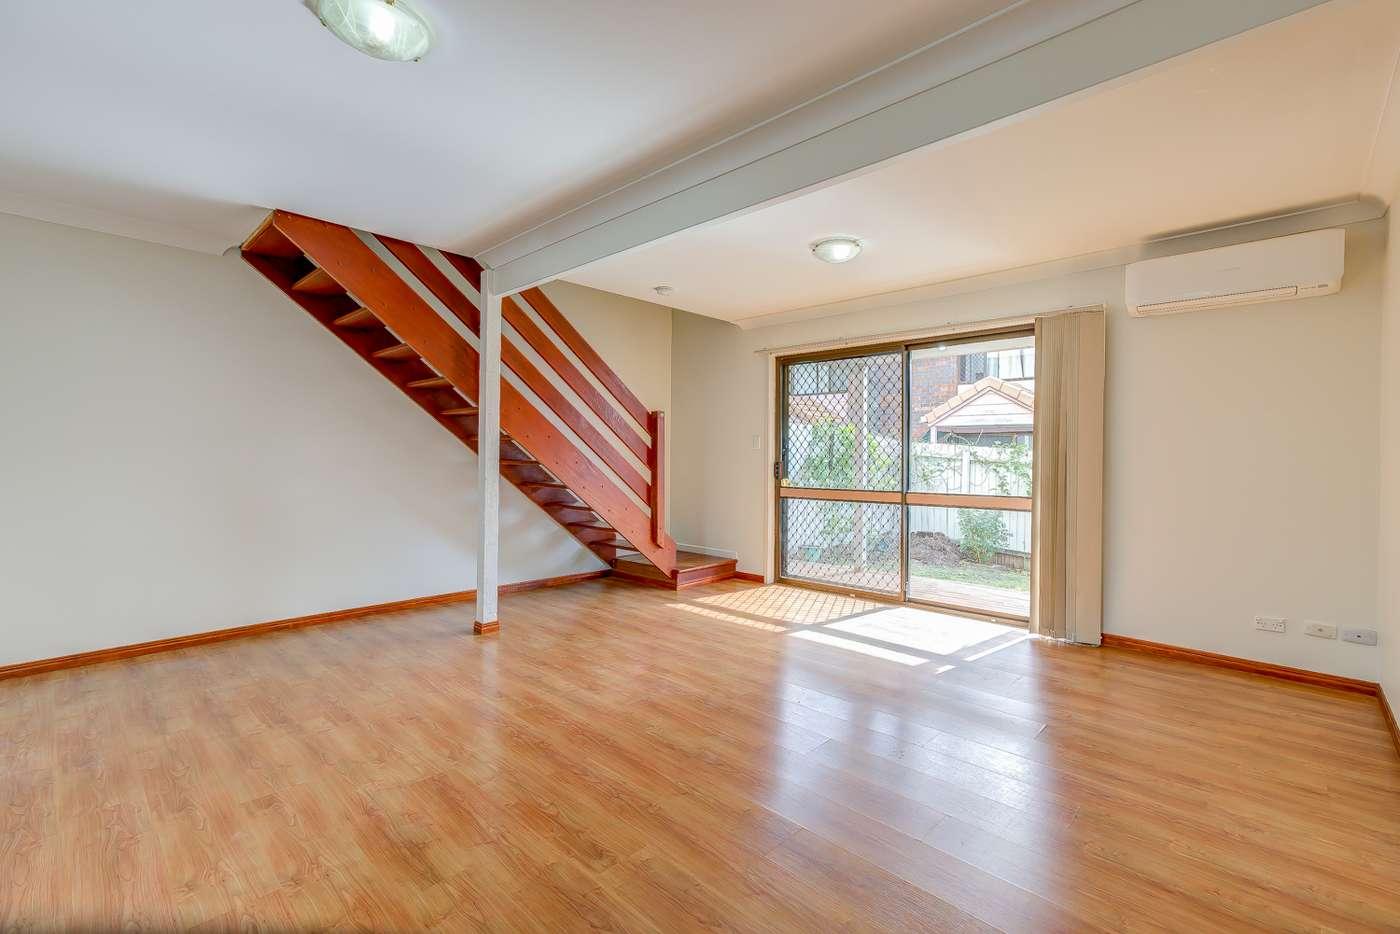 Seventh view of Homely house listing, 17/10 Damalis Street, Woodridge QLD 4114